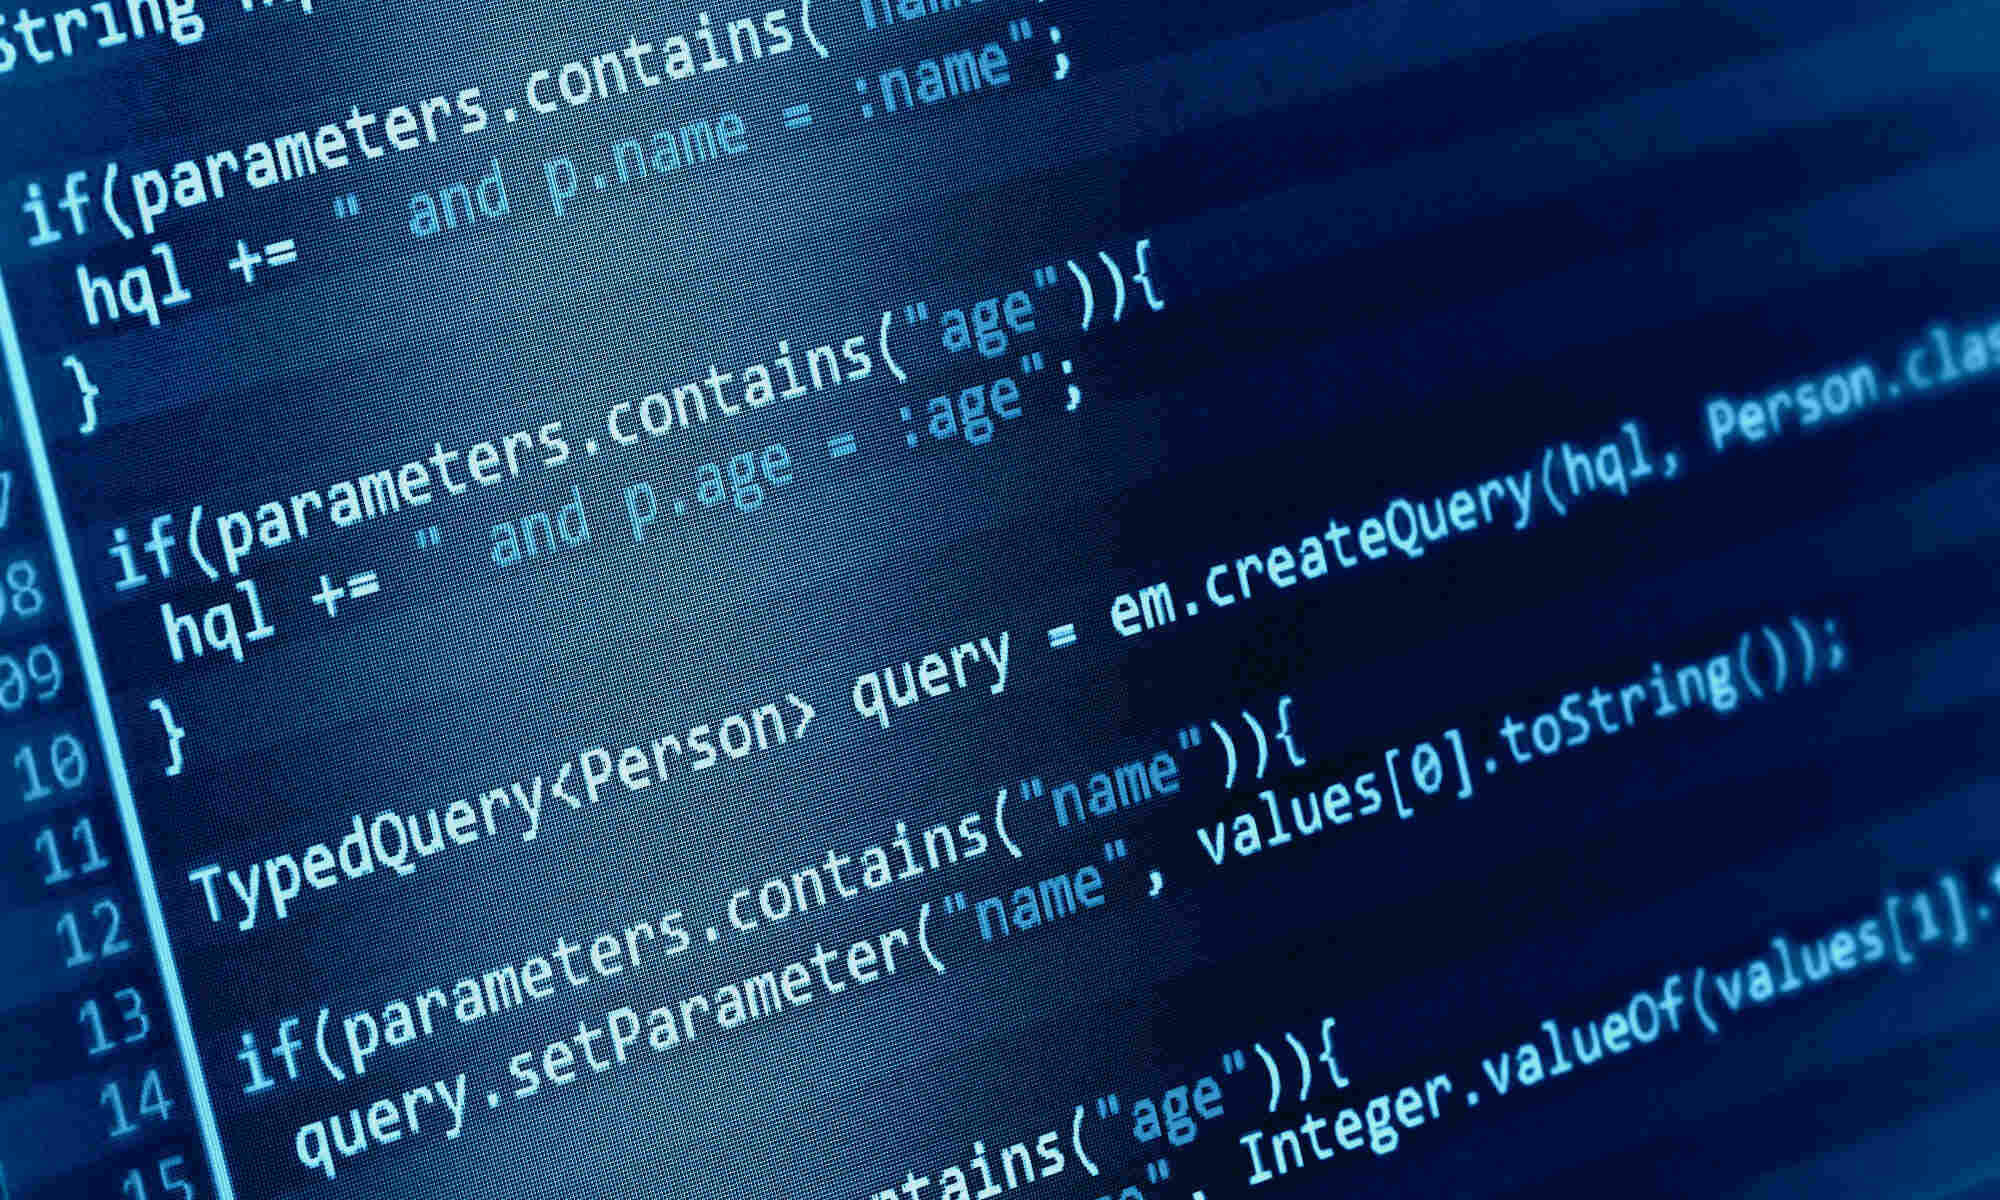 C#, .NET, Java, Php, Python, Wordpress, Windows, Linux...